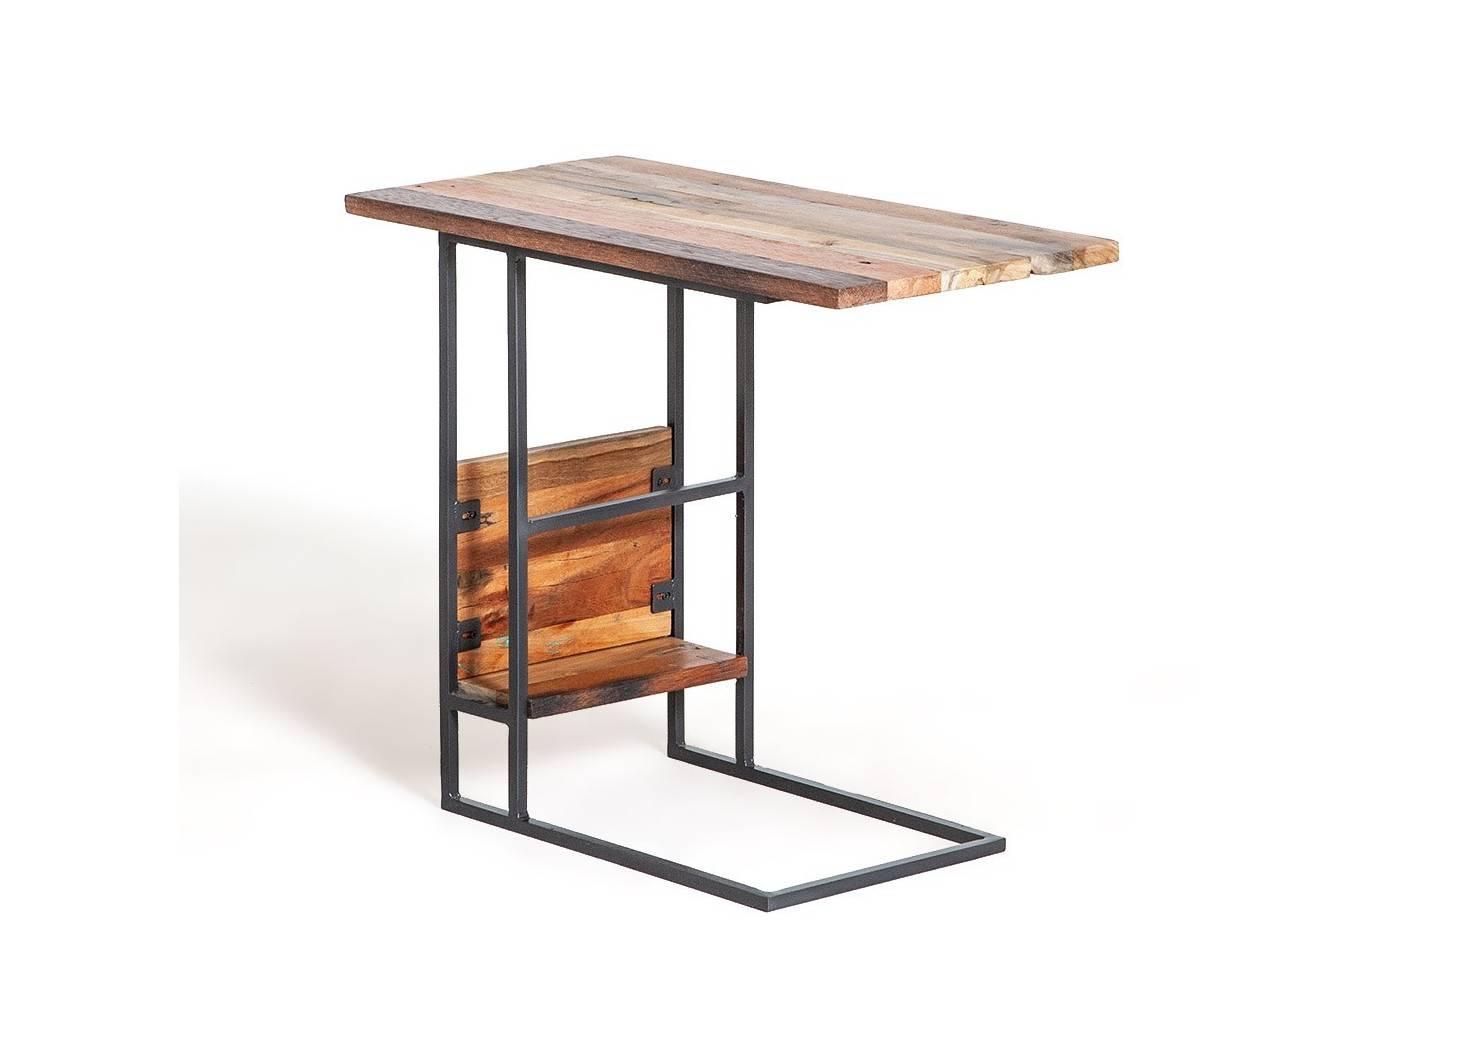 Table d'appoint Improvement